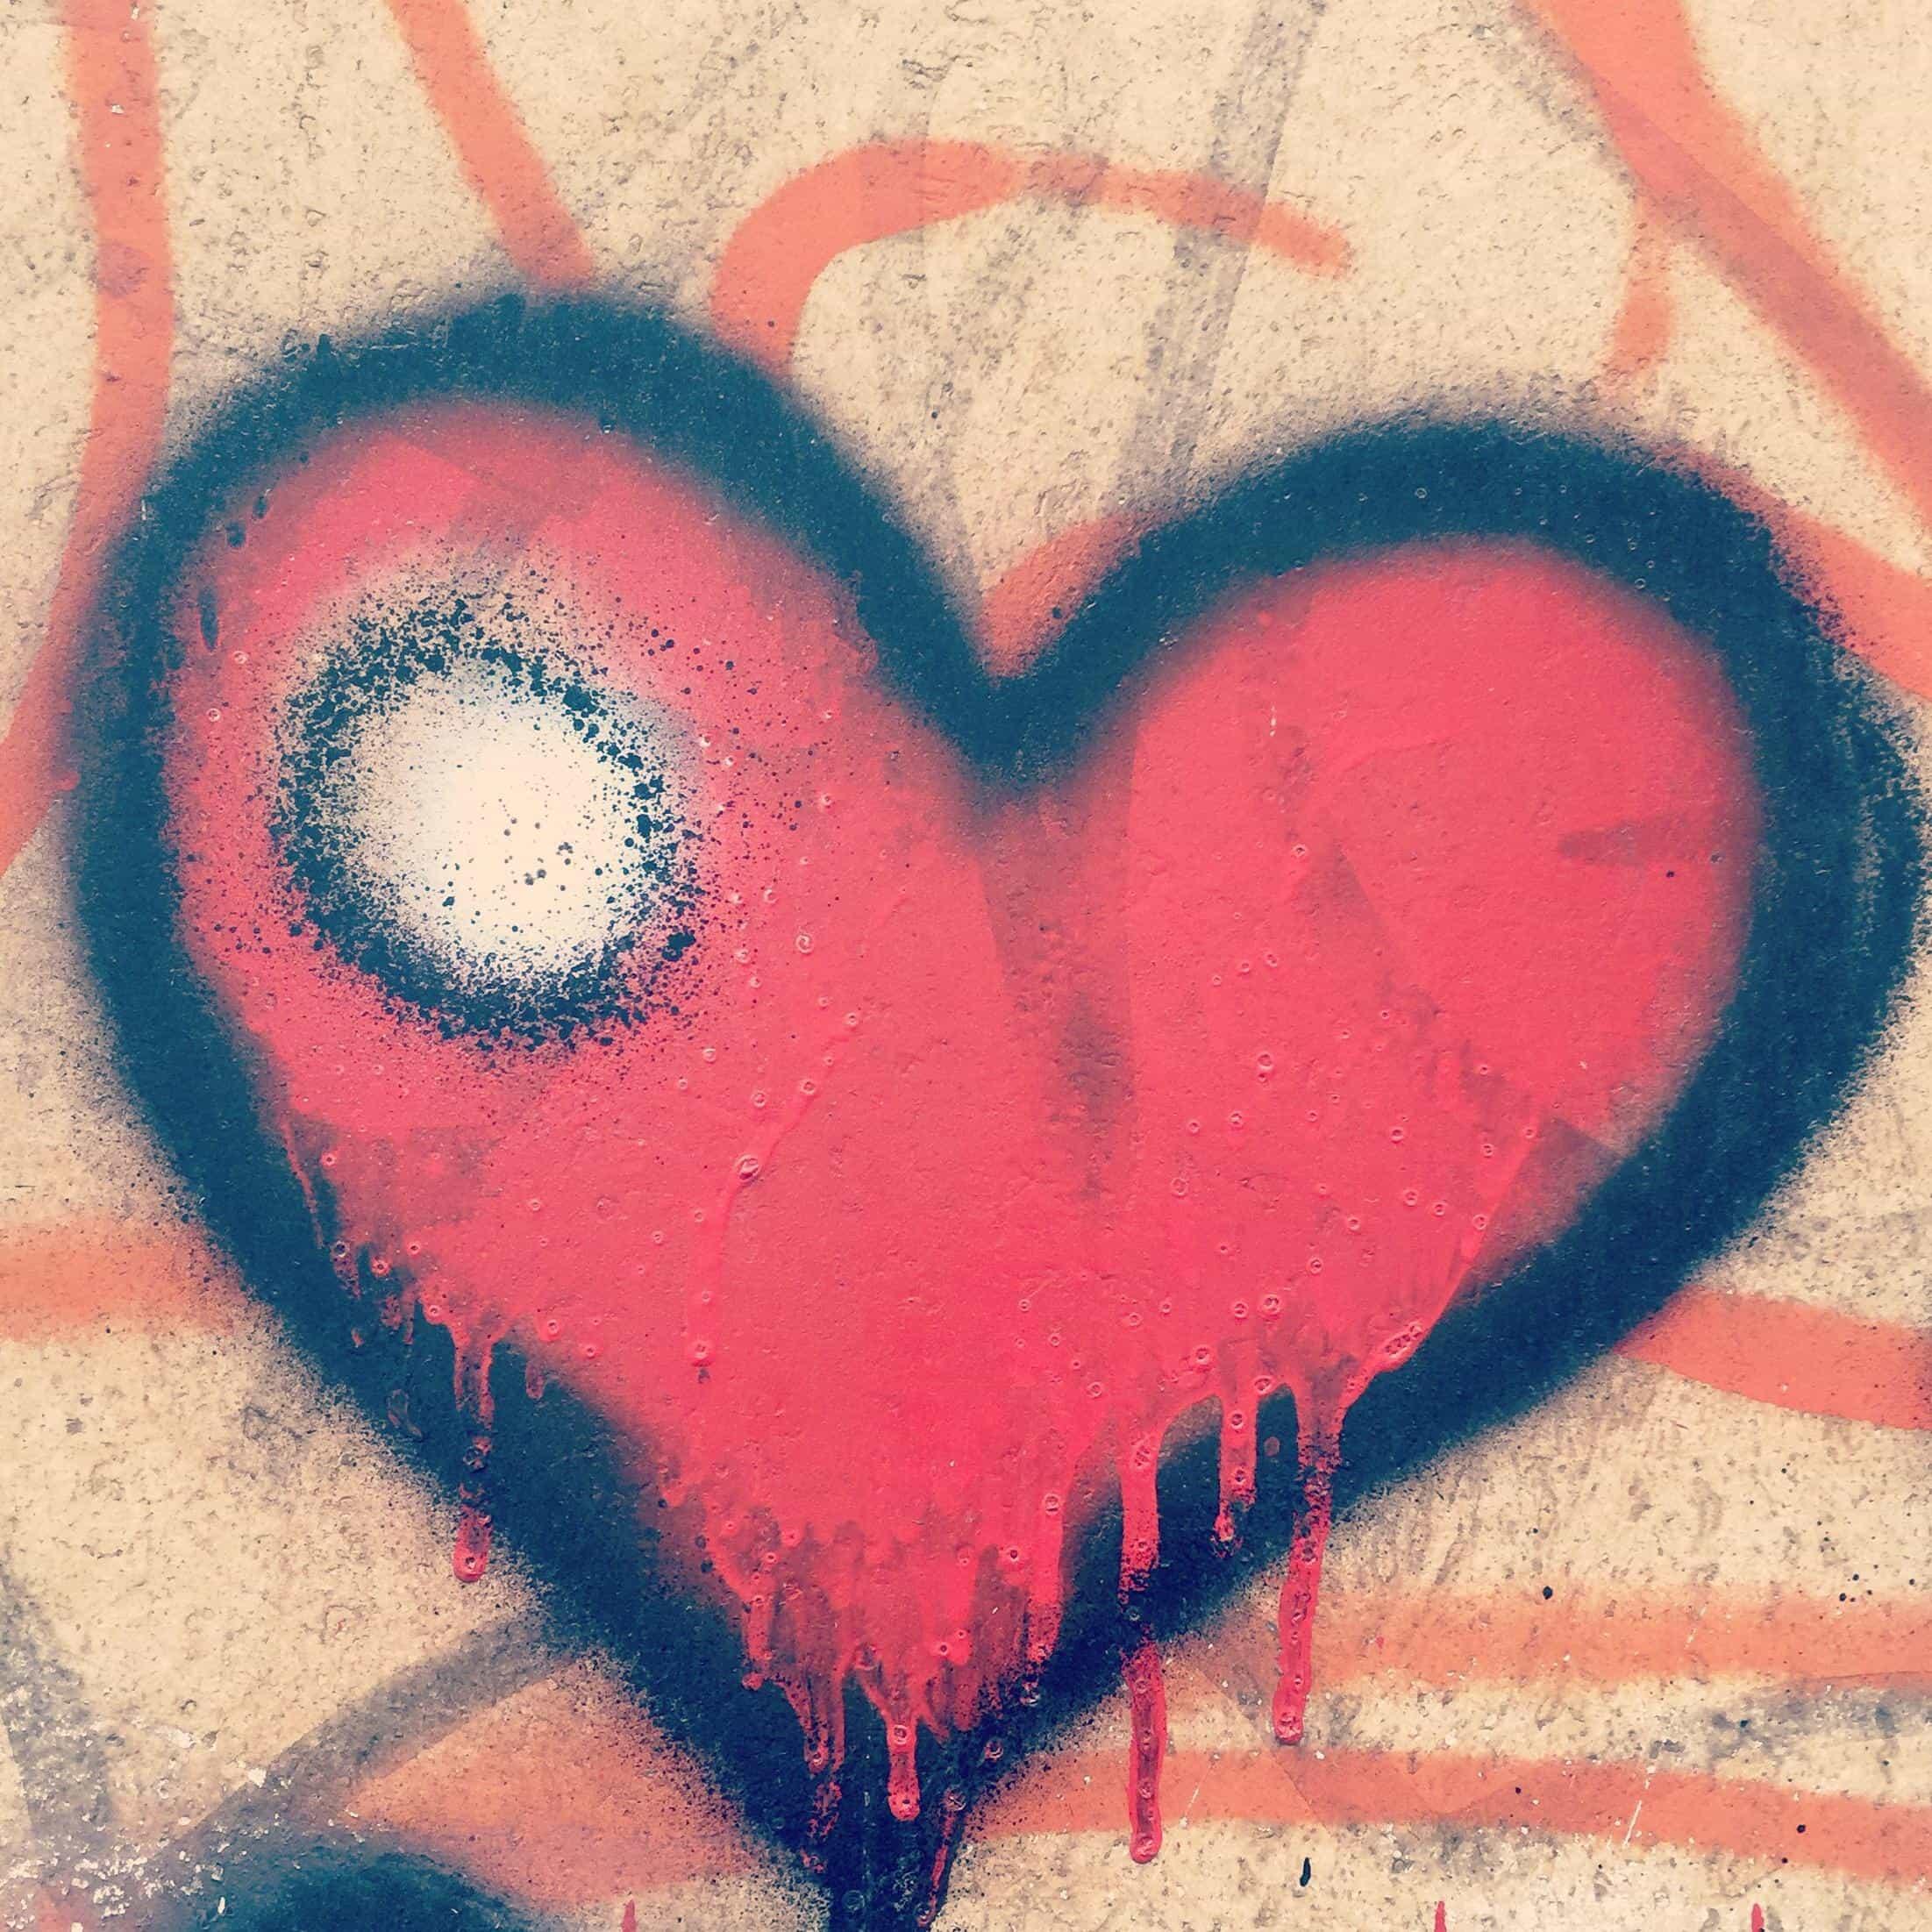 Free picture graffiti heart paper artistic art love